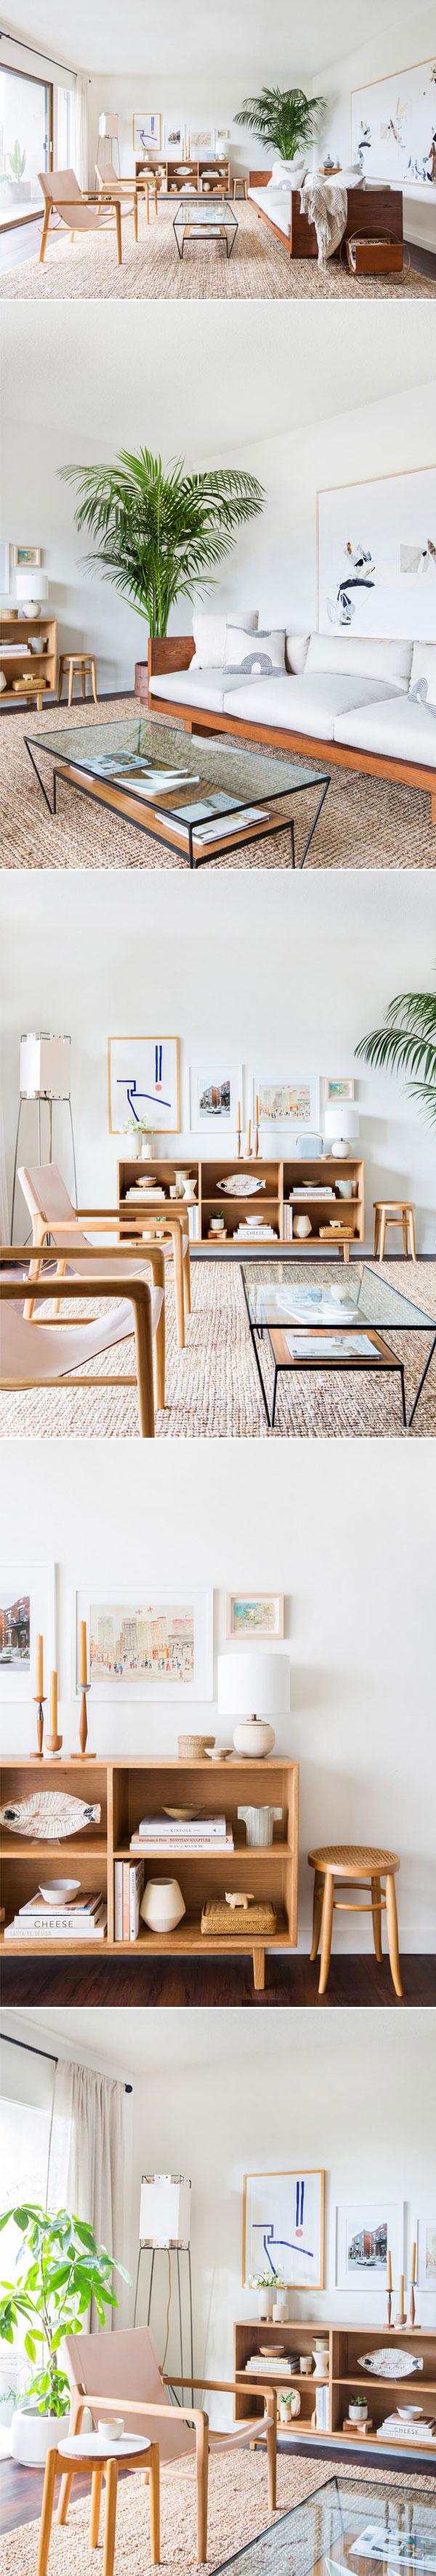 Uma sala minimal e aconchegante | Melanie from Emily Henderson Design